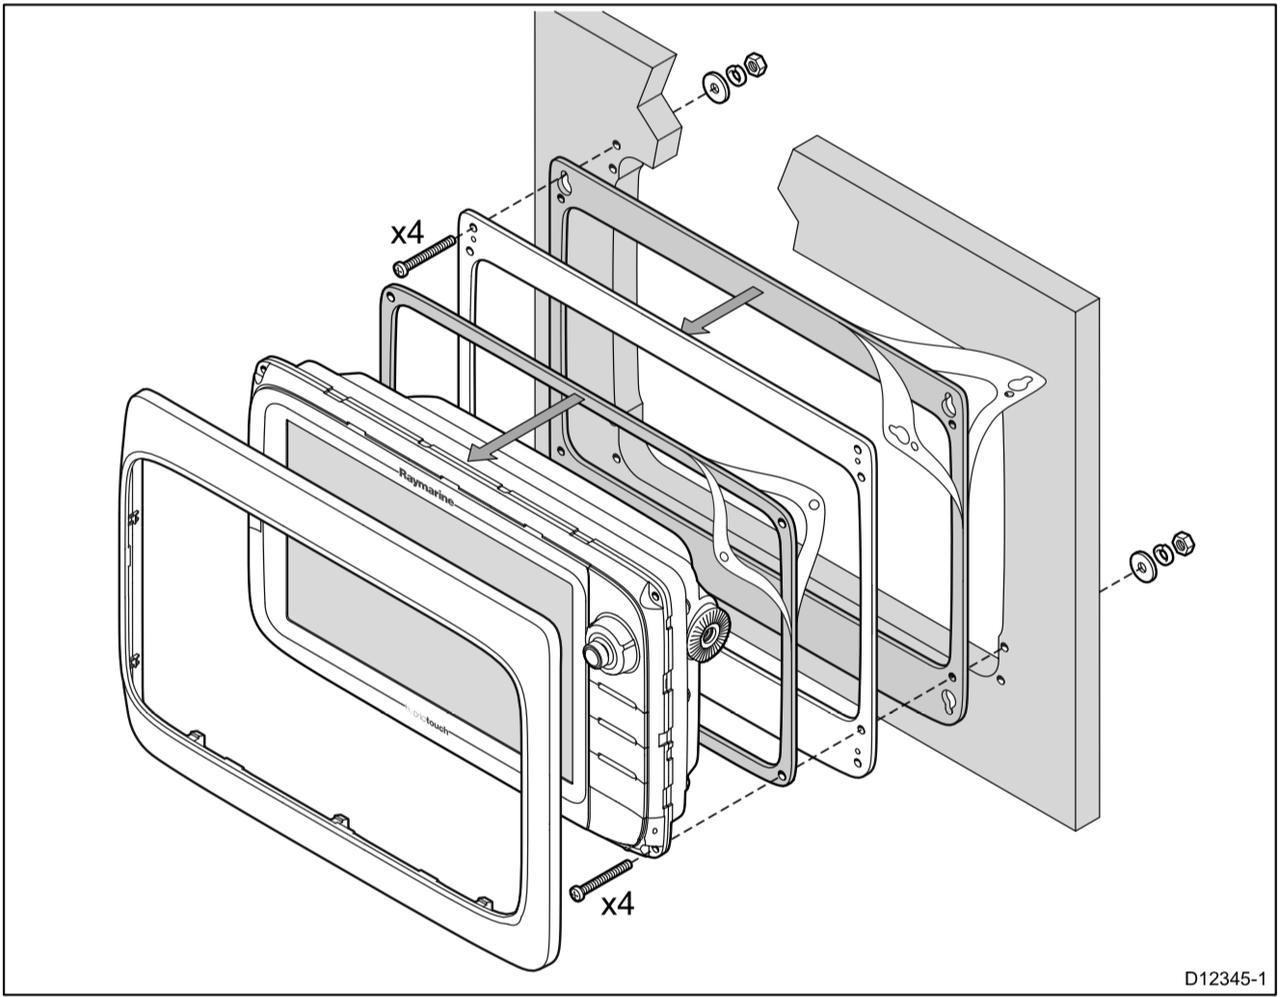 wrg 1822 441s garmin wiring diagram 441s garmin wiring diagram [ 1280 x 997 Pixel ]